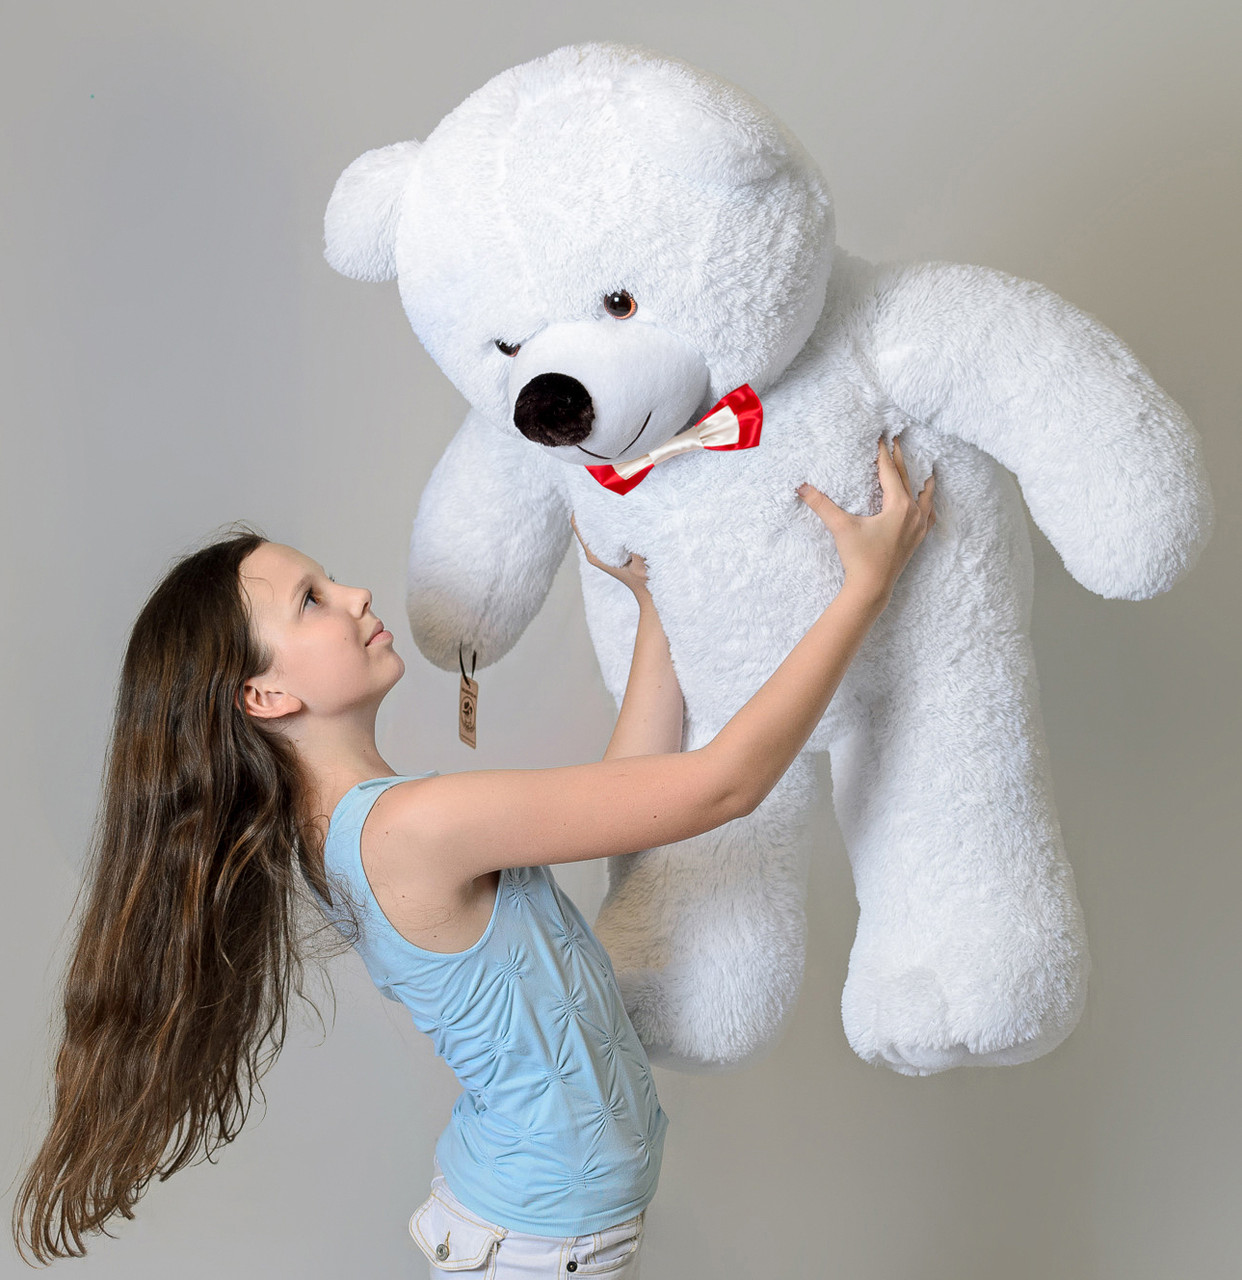 Плюшевий ведмедик Mister Medved Білий 130 см